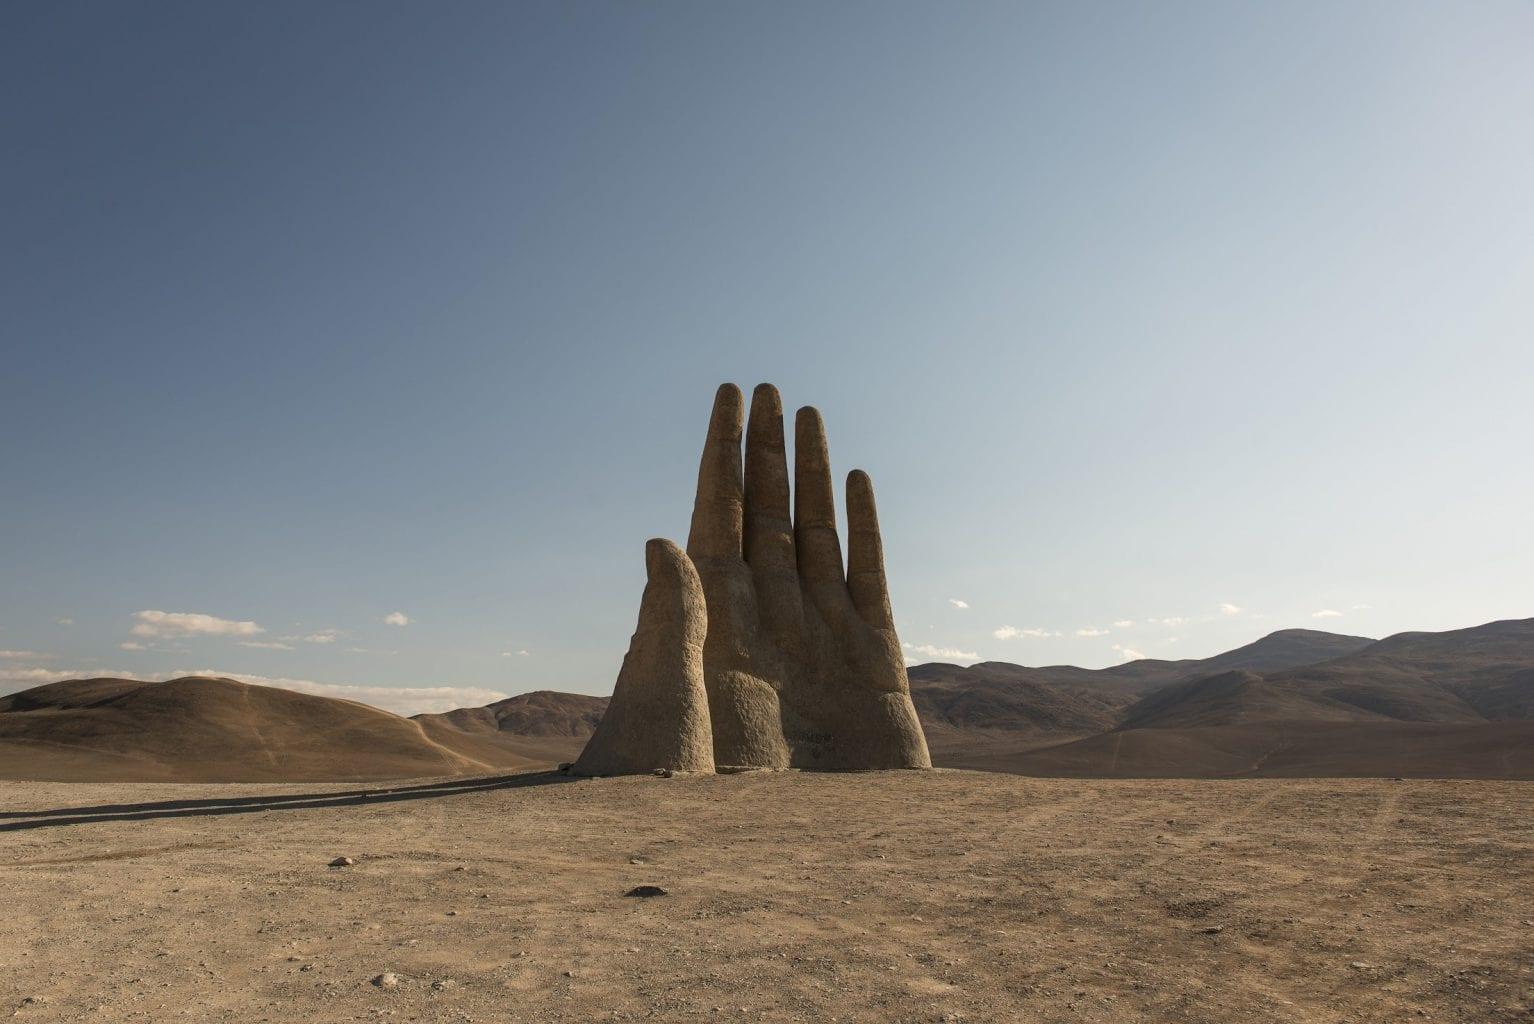 Mano del Desierto in the middle of the Atacama desert. Credit: CNN